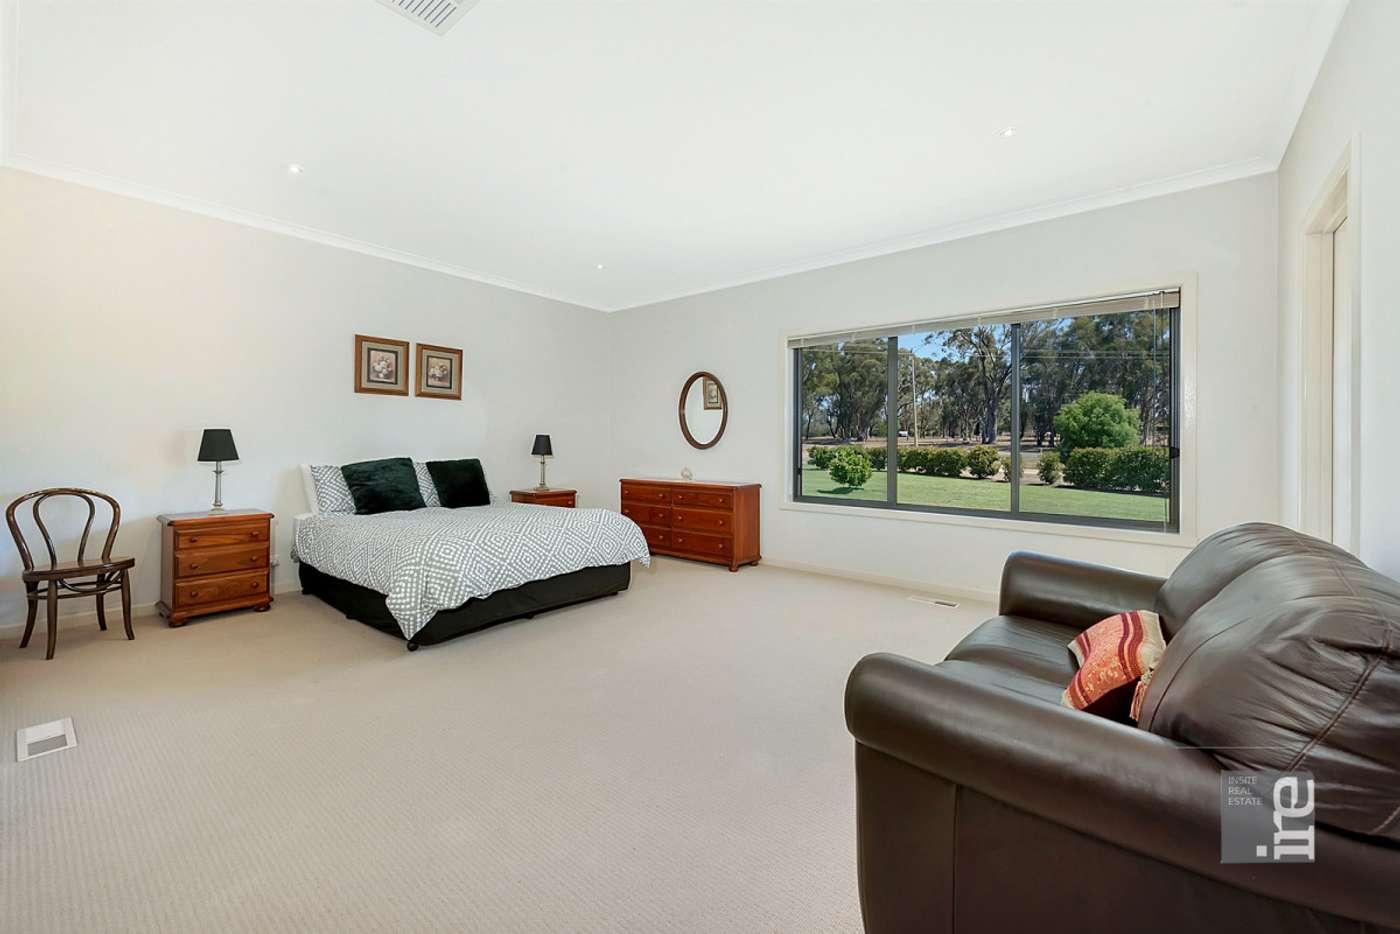 Sixth view of Homely house listing, 5 Waldara Drive, Wangaratta VIC 3677